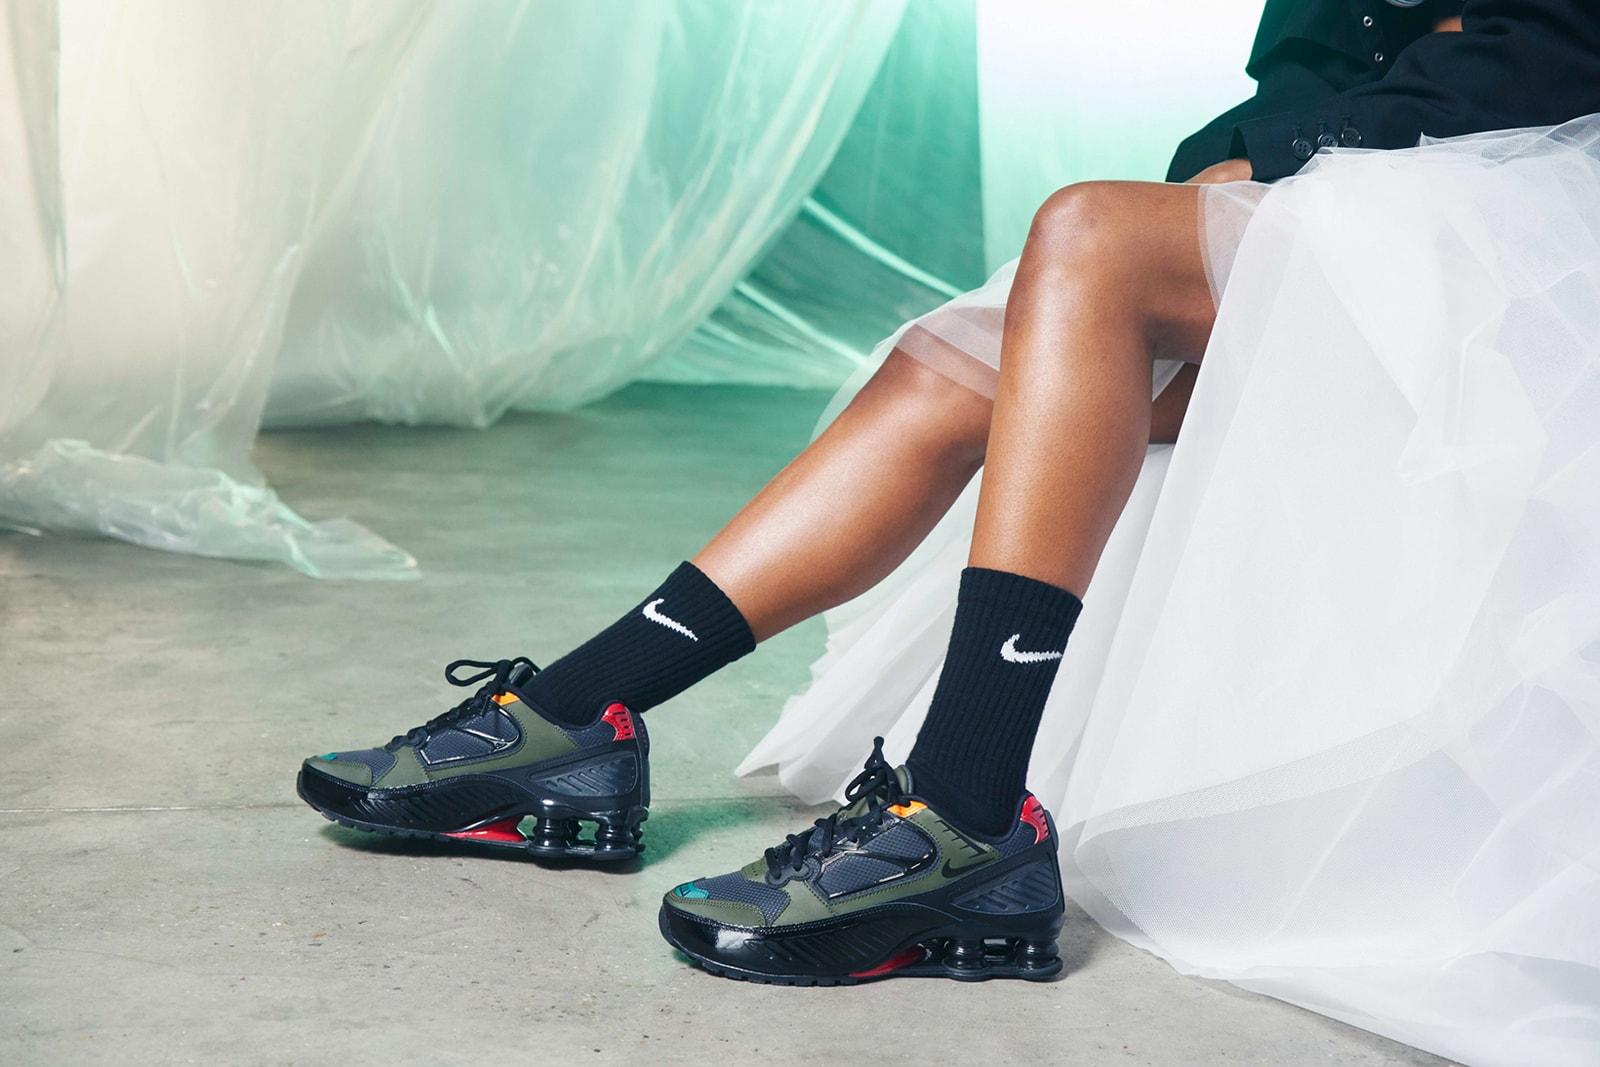 Keyah/Blu Nike Shox Film London Female Musician Sneakers Trainers